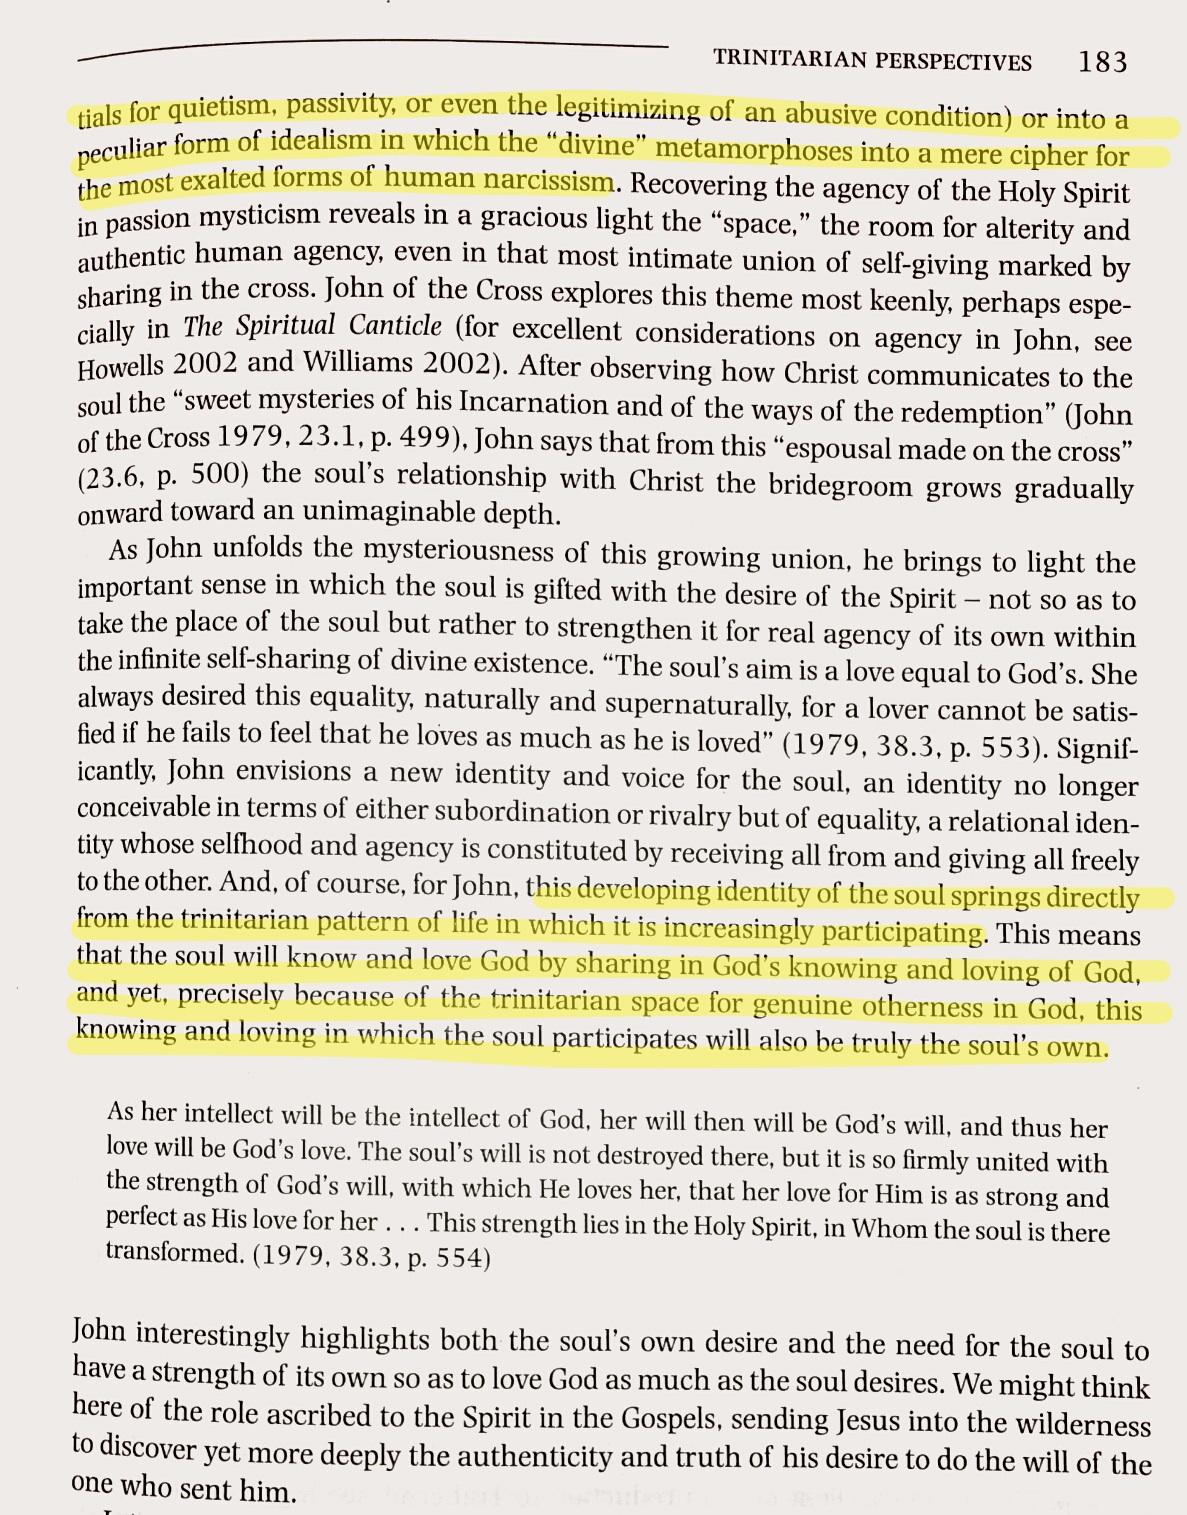 A Trinitarian Perspective 07